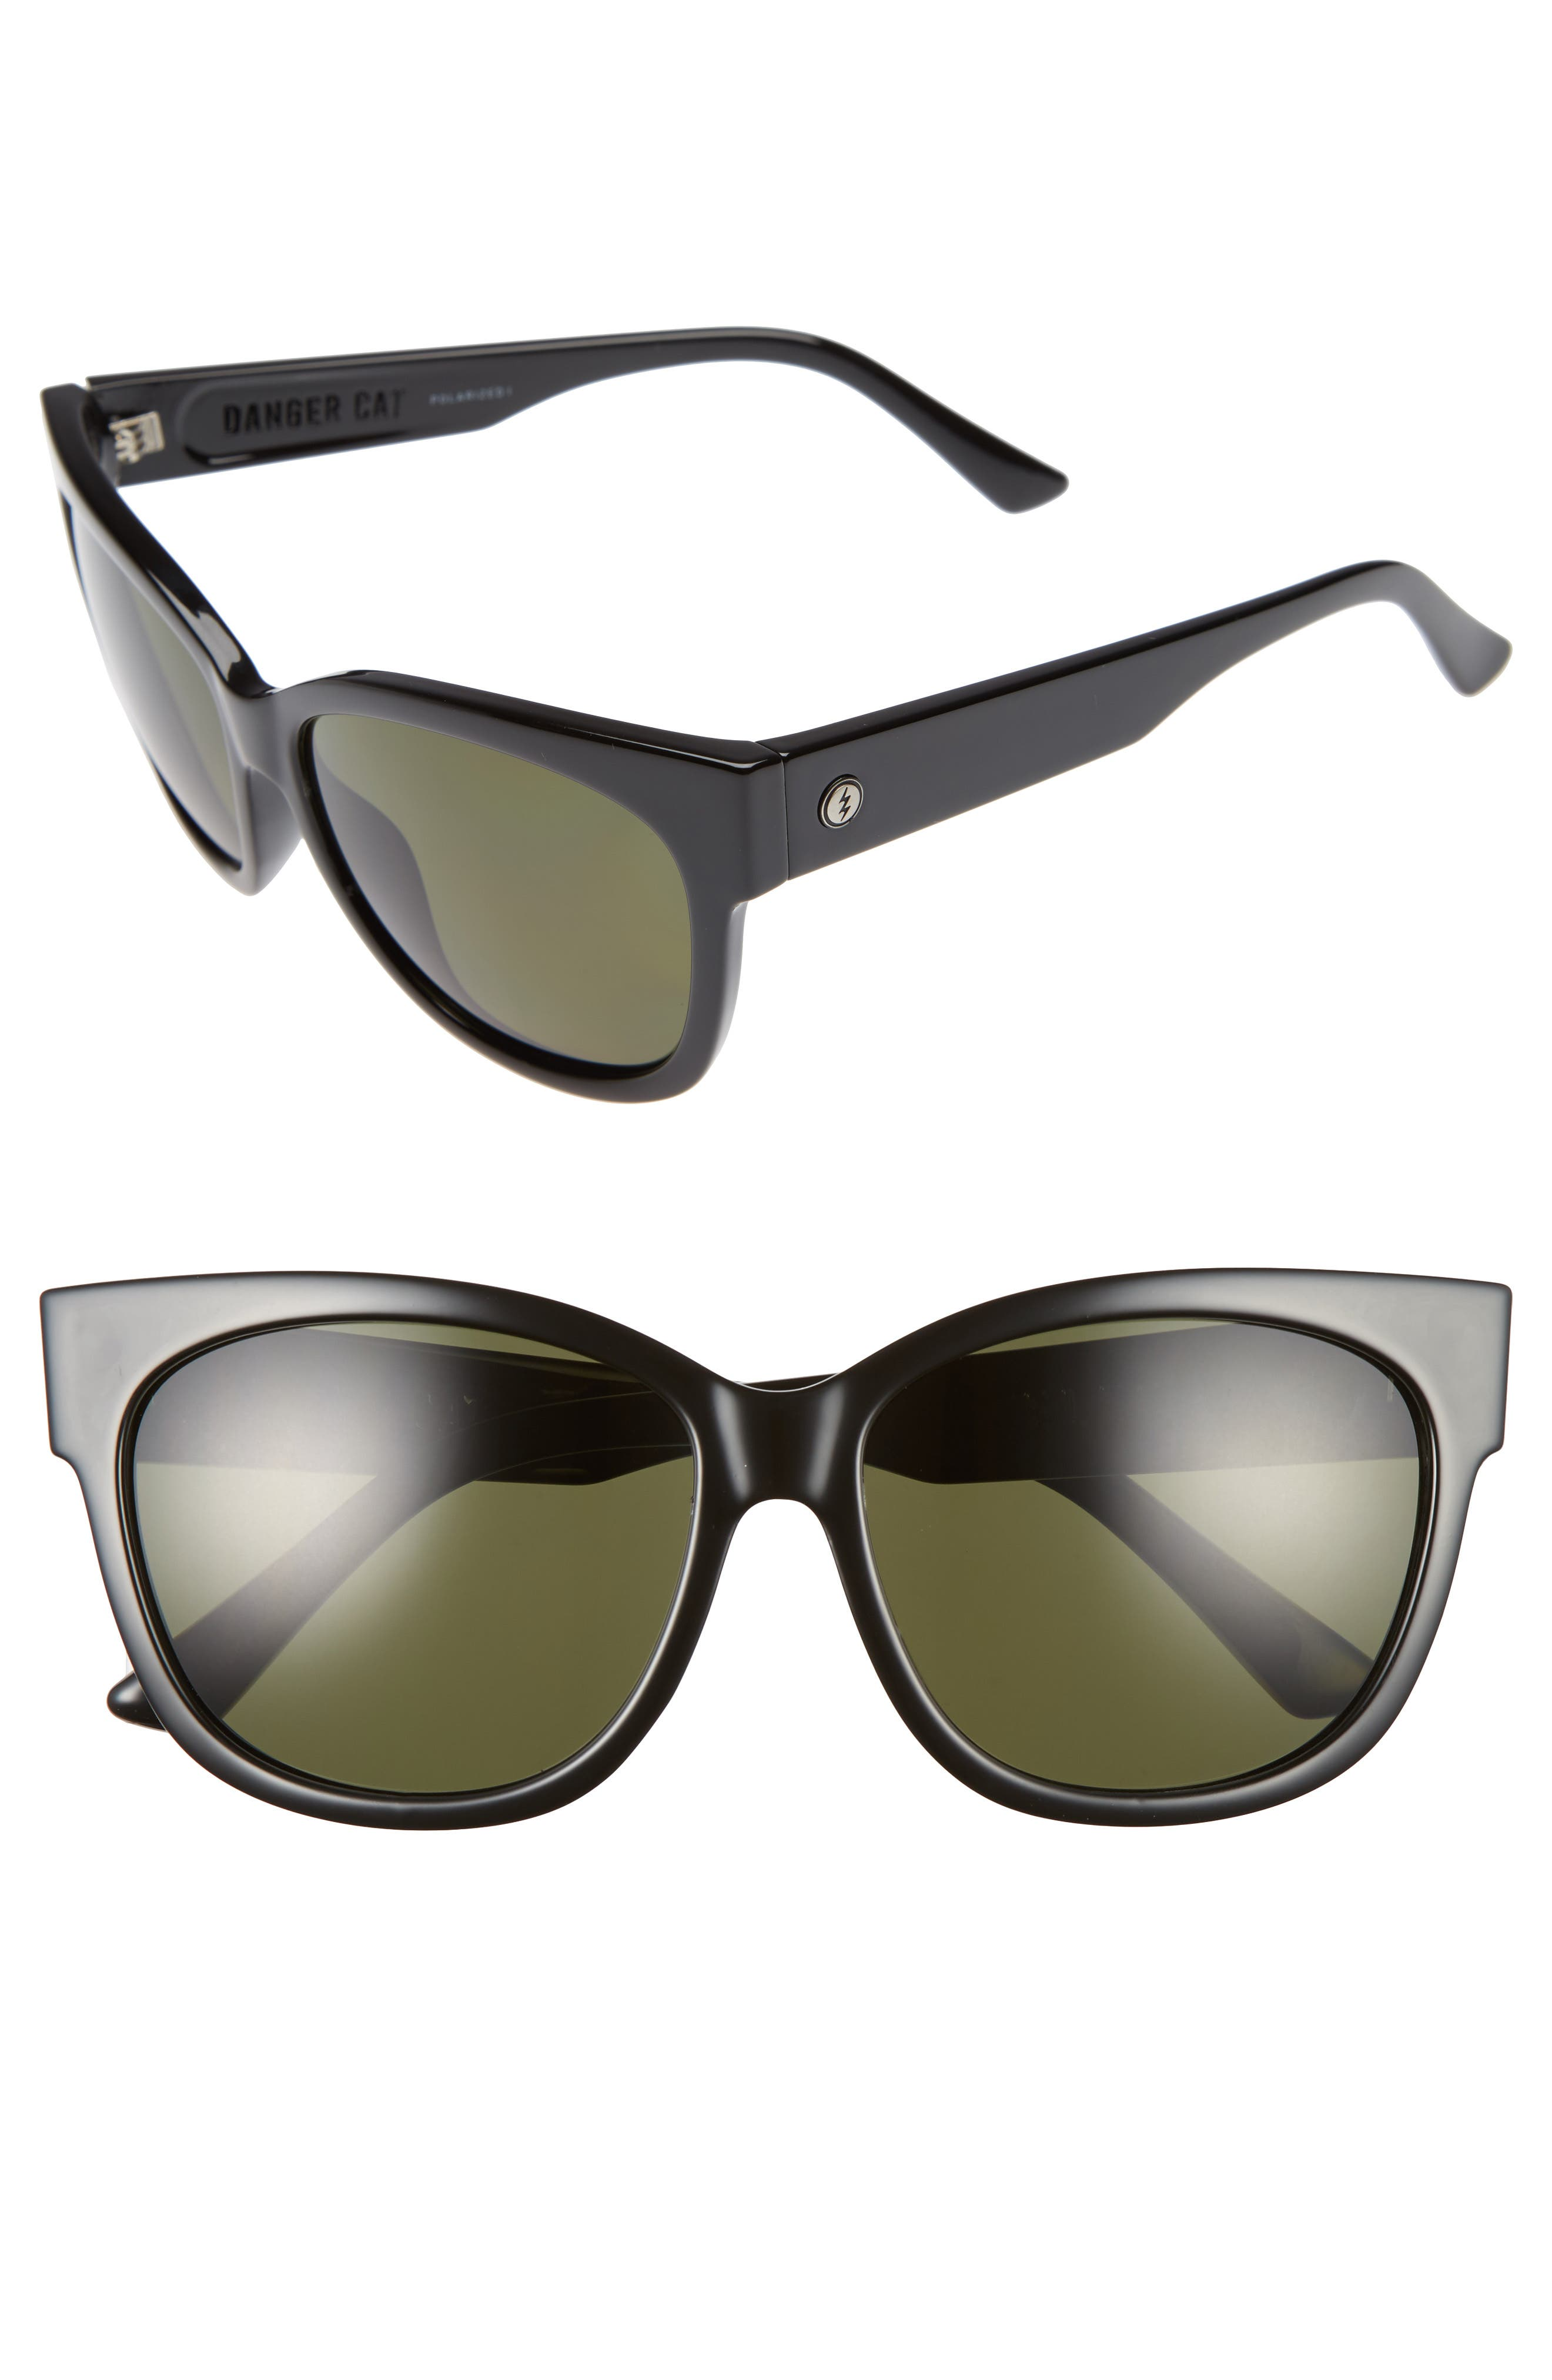 Danger Cat 58mm Sunglasses,                         Main,                         color, 001